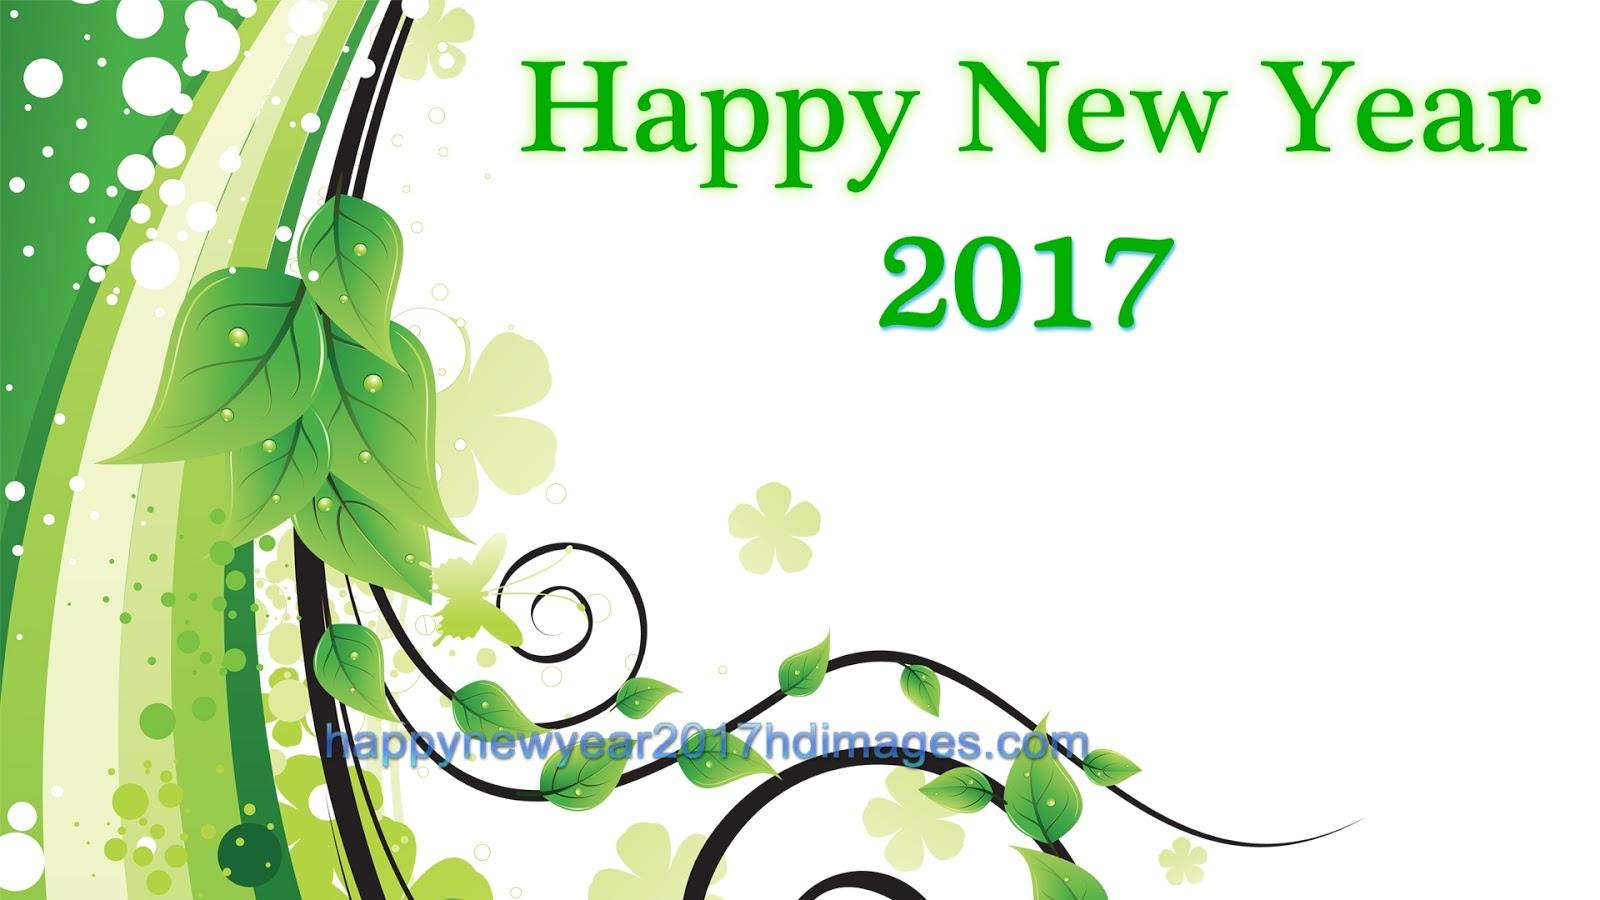 Wallpaper download 2017 - Happy New Year 2017 Hd Wallpaper Download